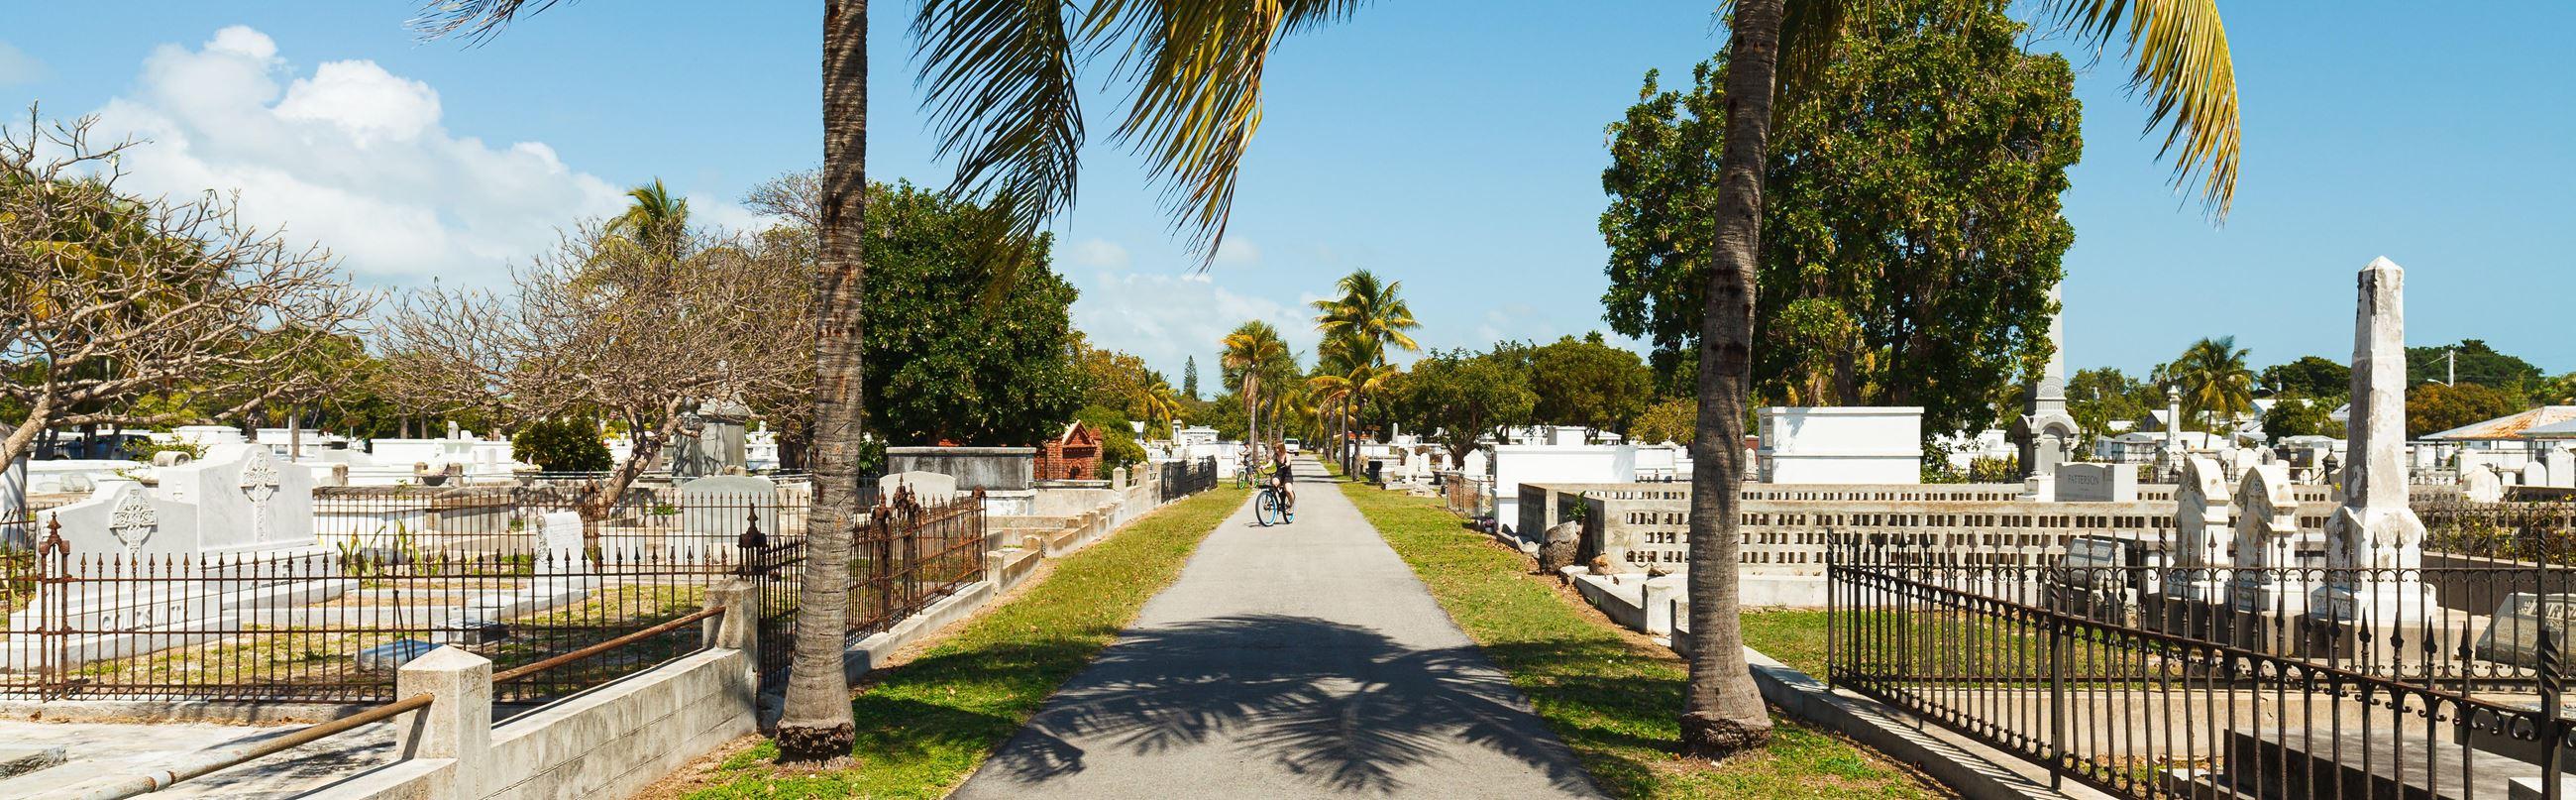 Key West Calendar Of Events 2022.Calendar Key West Fl Civicengage